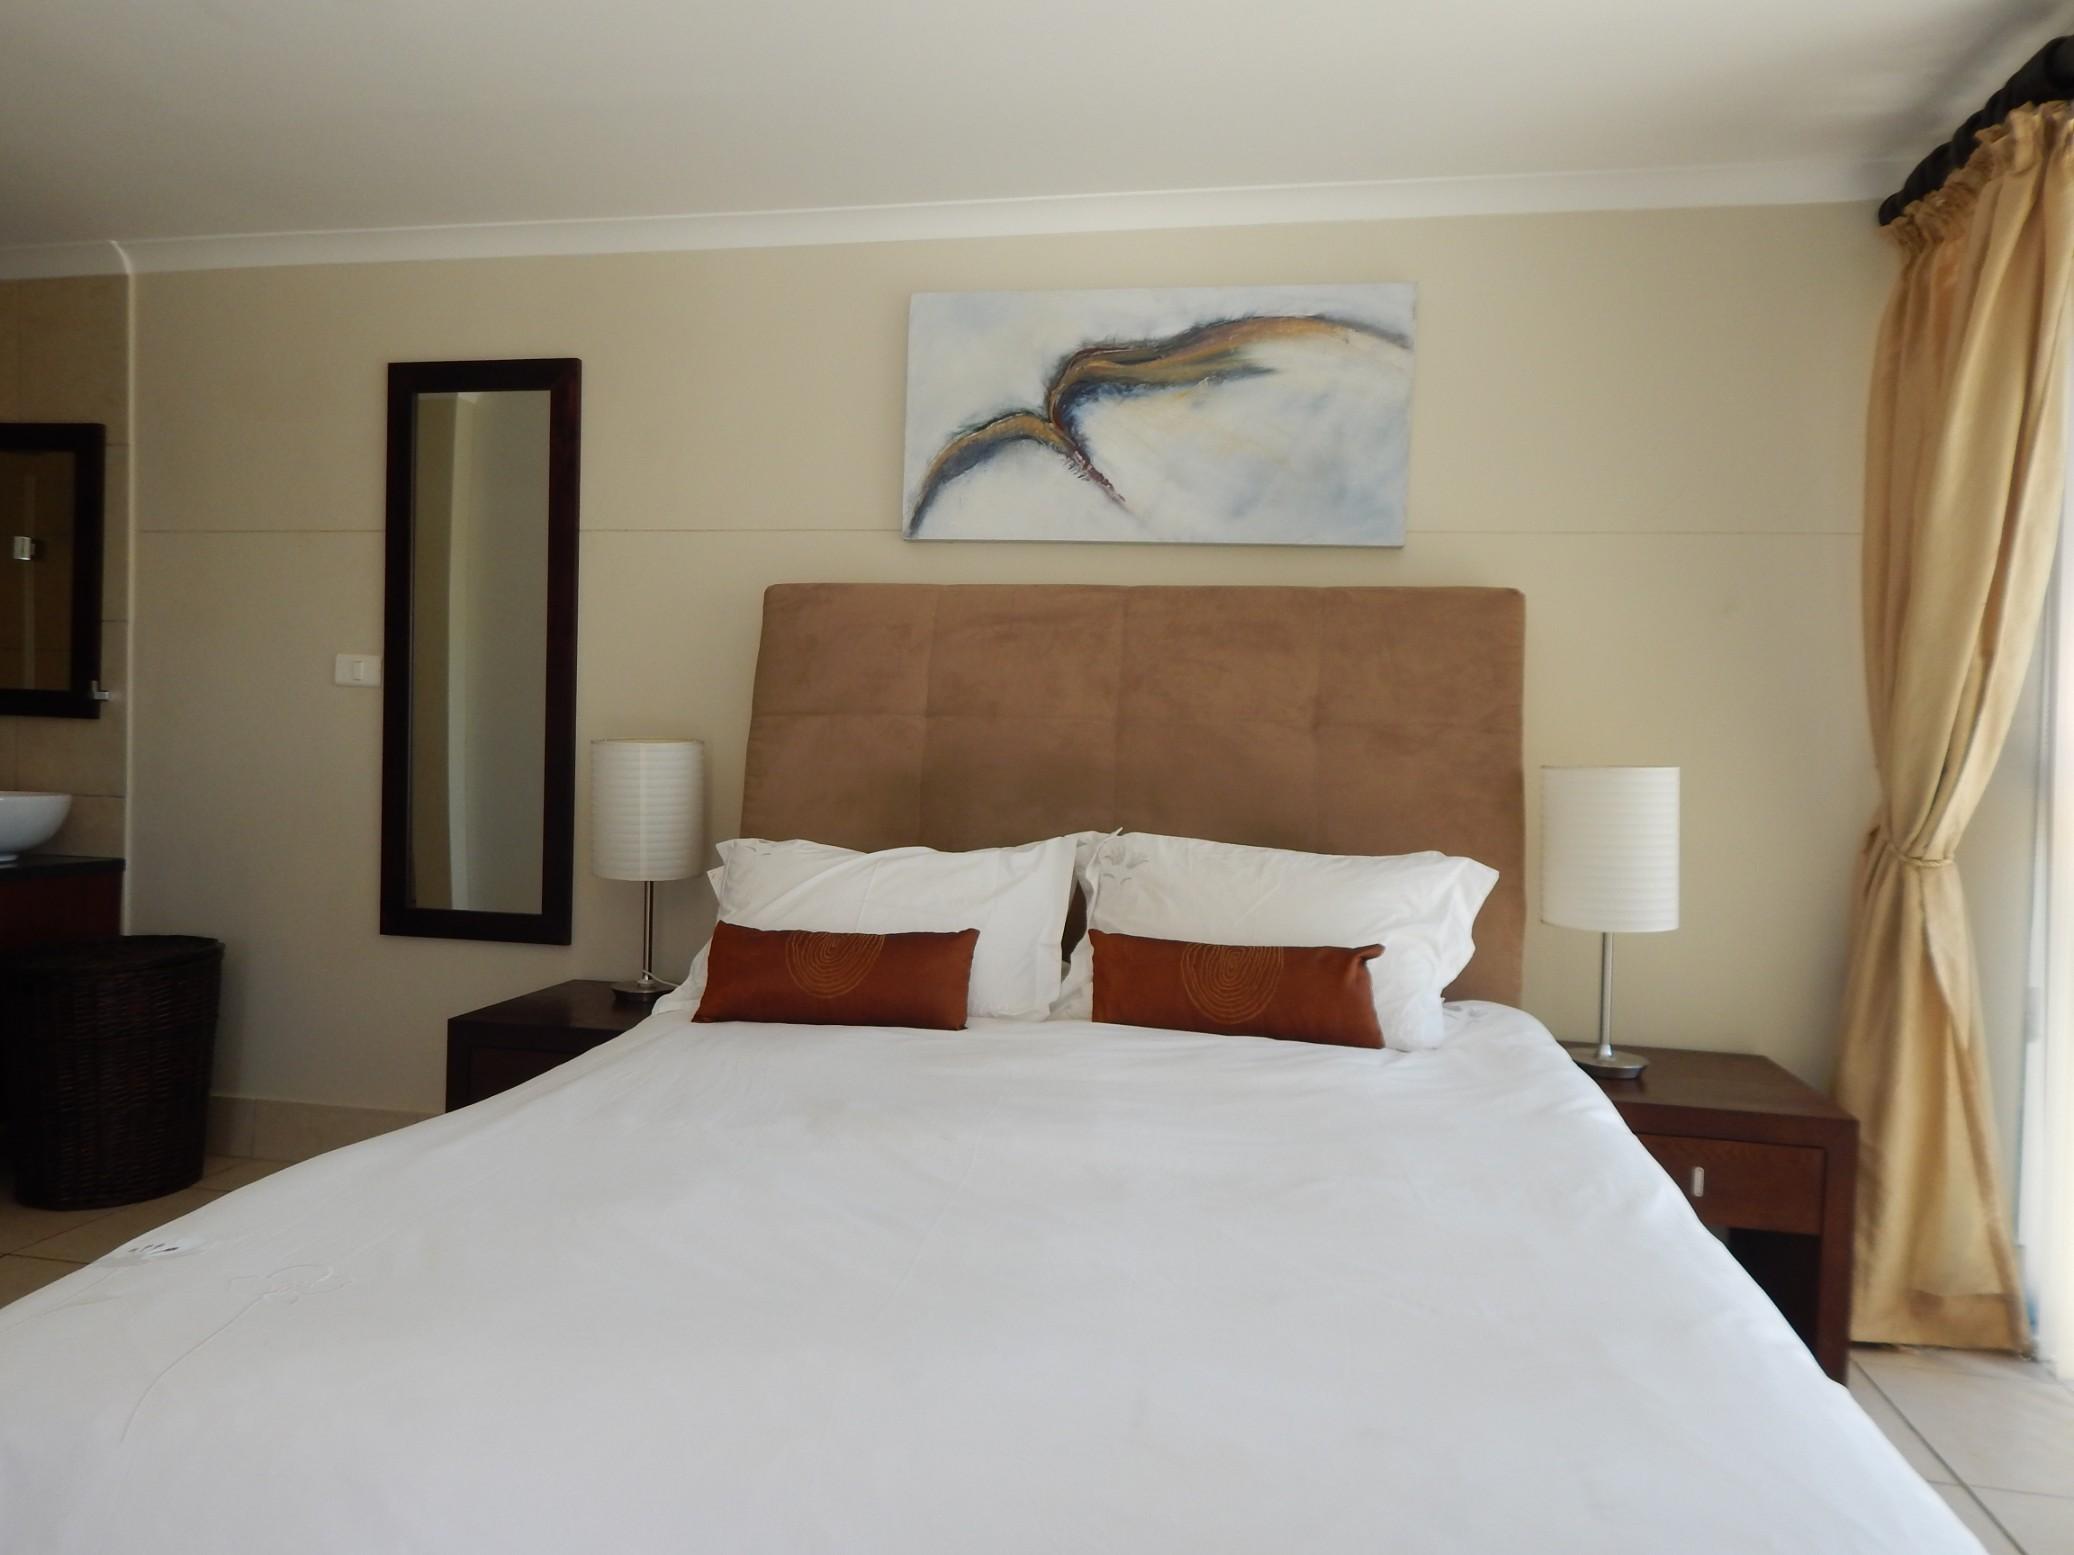 2 Bedroom Apartment for sale in De Bakke ENT0067862 : photo#6